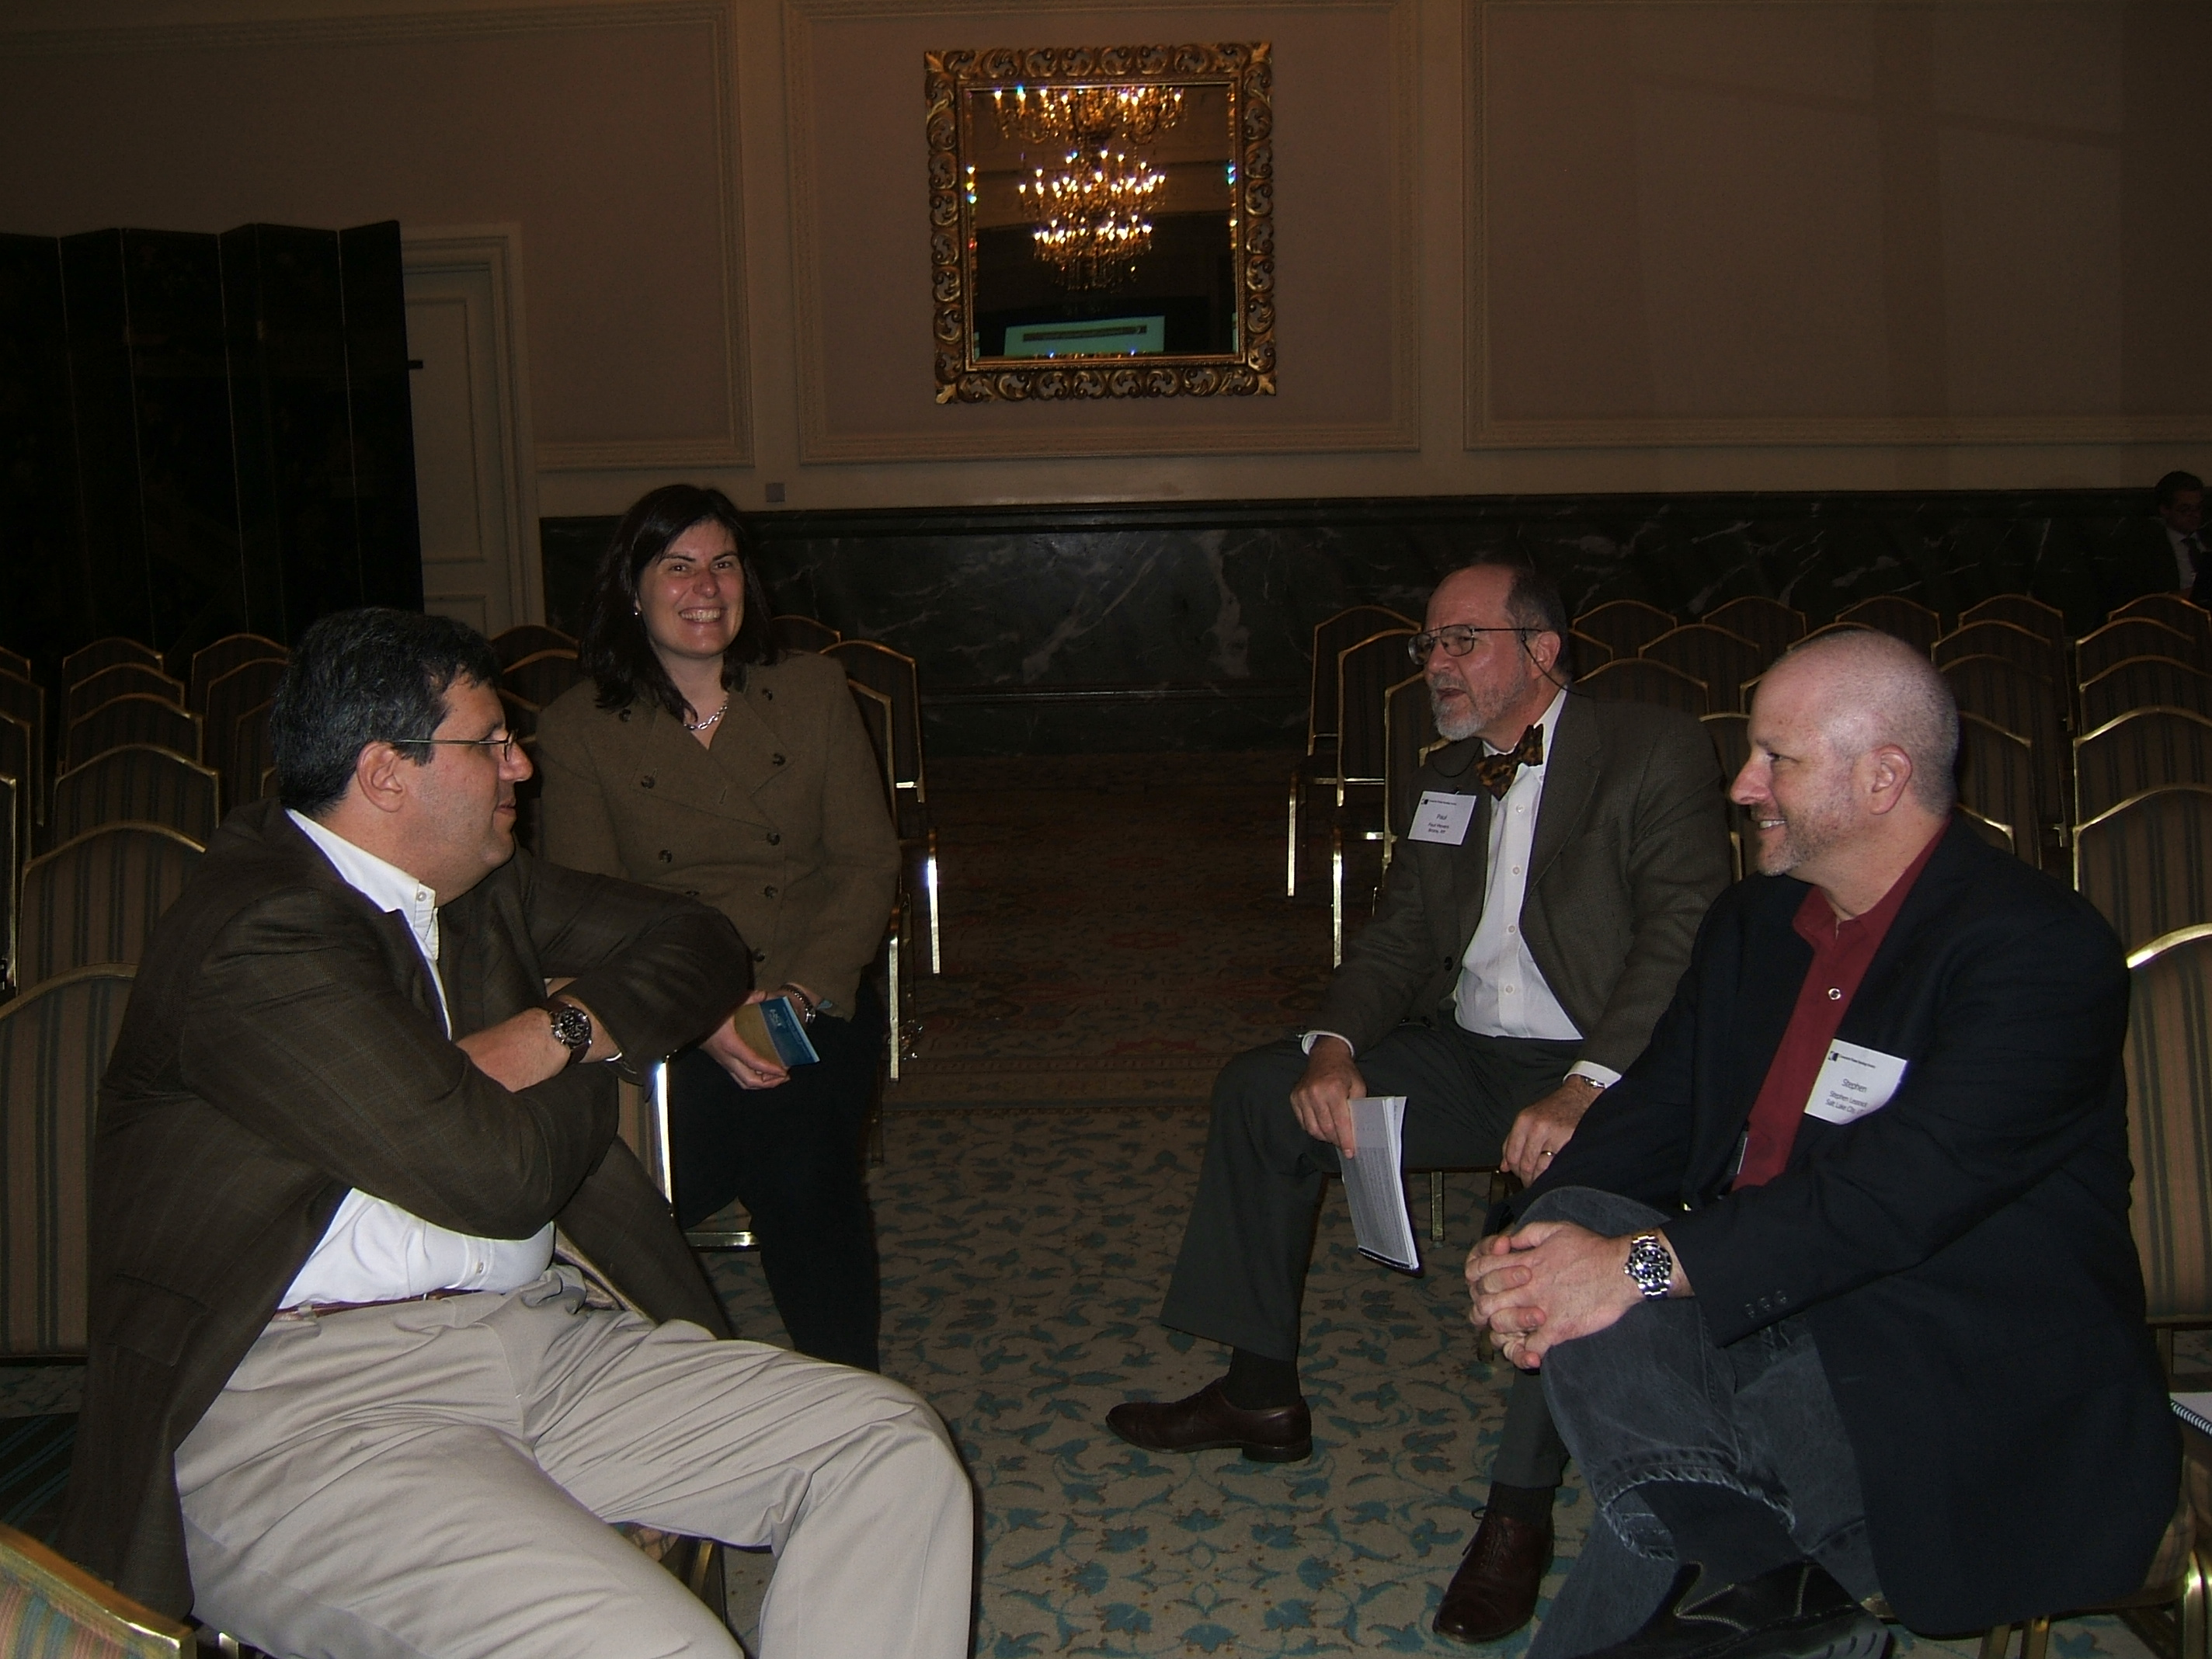 Jonathon Weber and colleagues